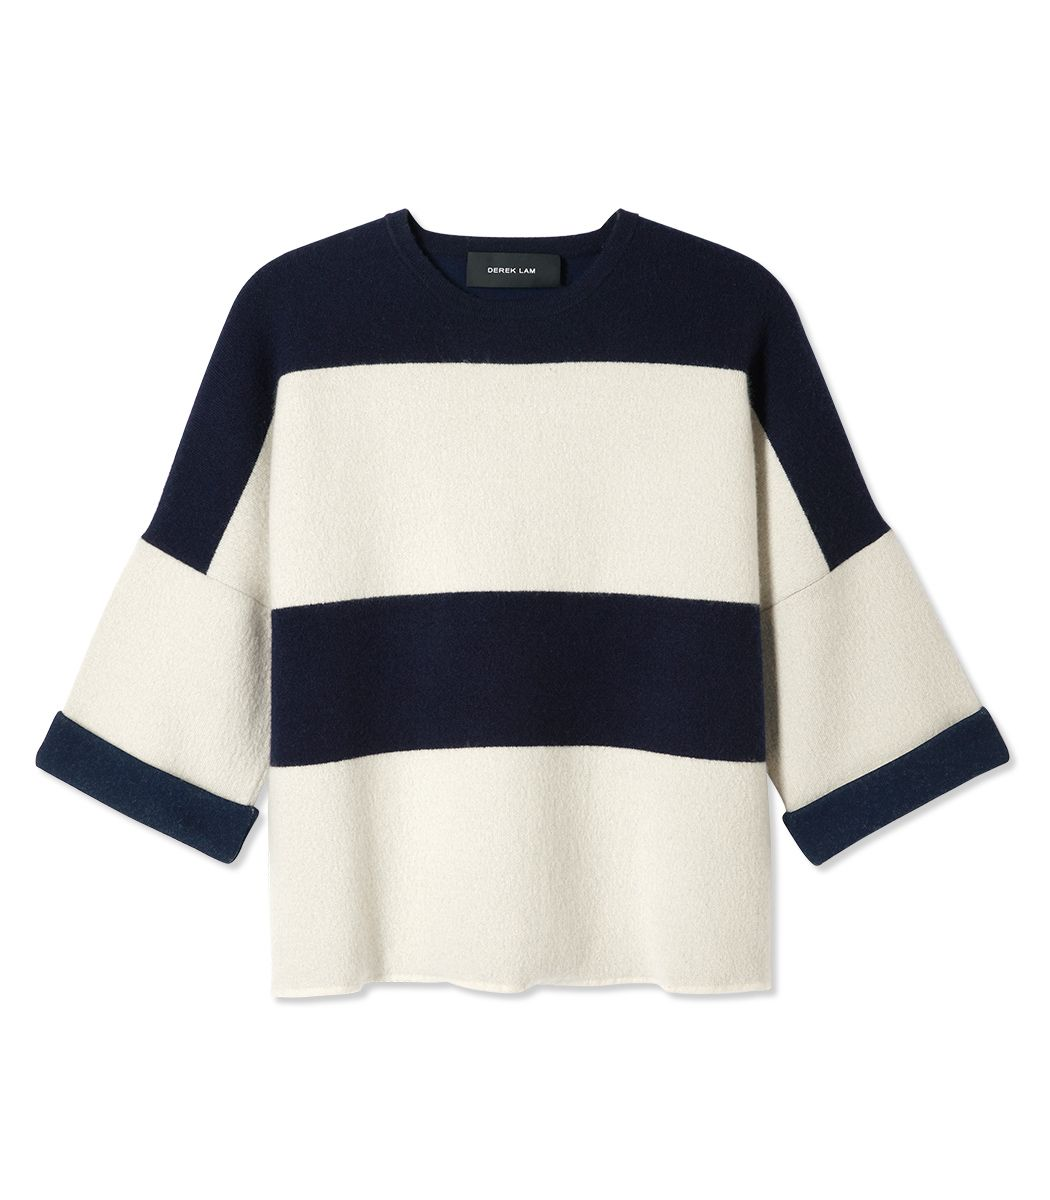 Derek Lam Stripe Top - Shop more summer date night looks: http://www.harpersbazaar.com/fashion/fashion-articles/summer-2014-date-outfits